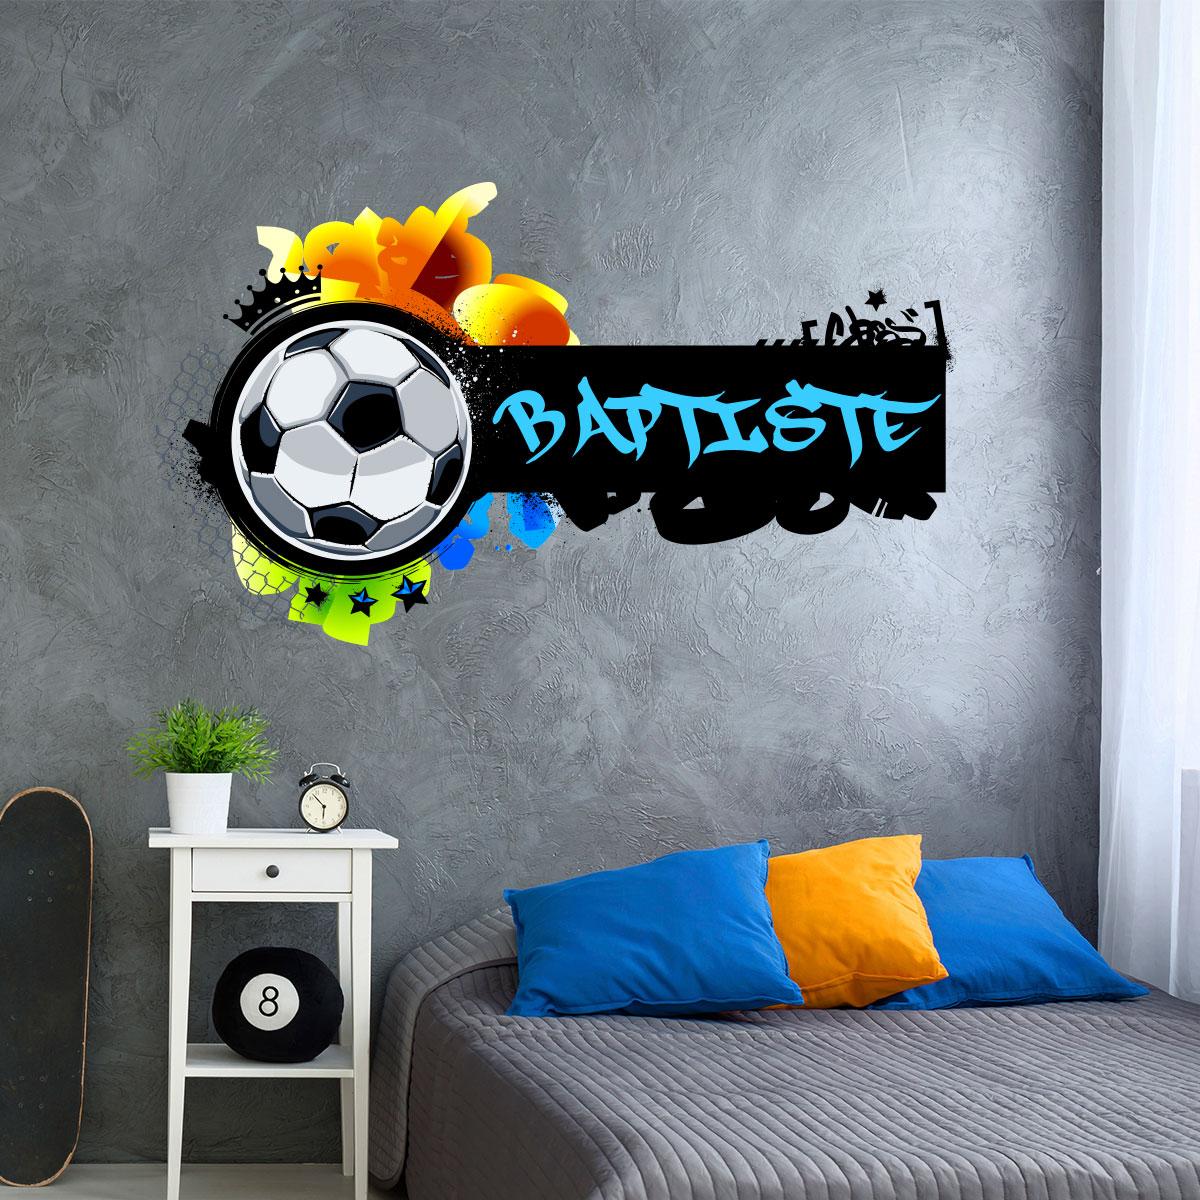 Sticker prnom personnalisable football graffiti  Stickers Sports et Football Football